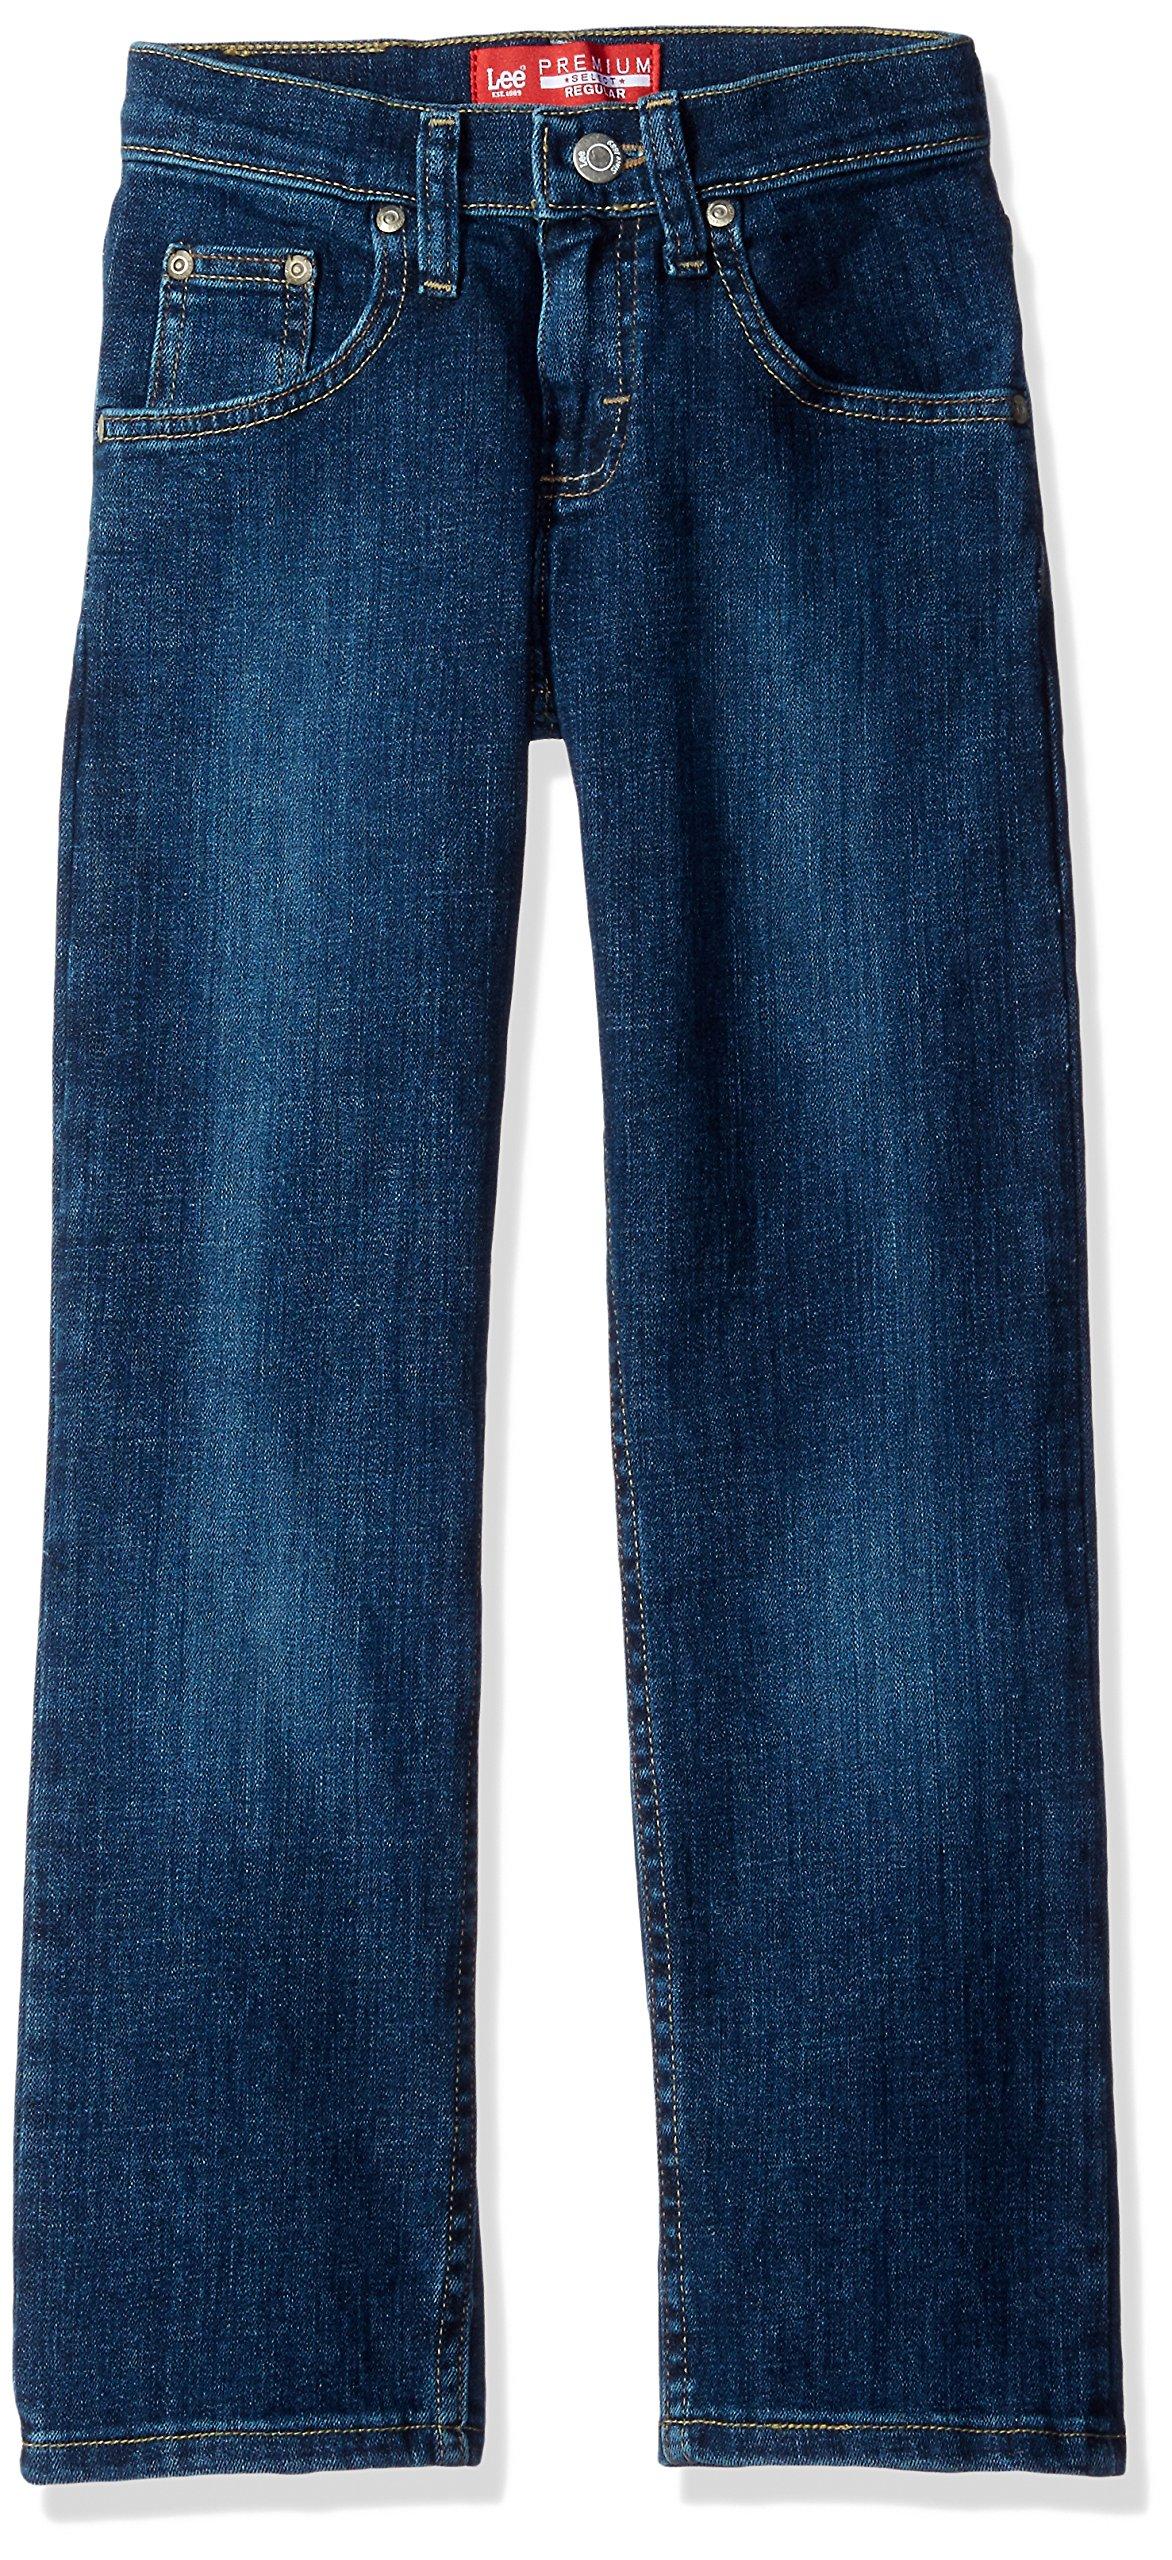 Lee Big Boys' Premium Select Regular Fit Straight Leg Jeans, Murphy Handsand, 14 Husky